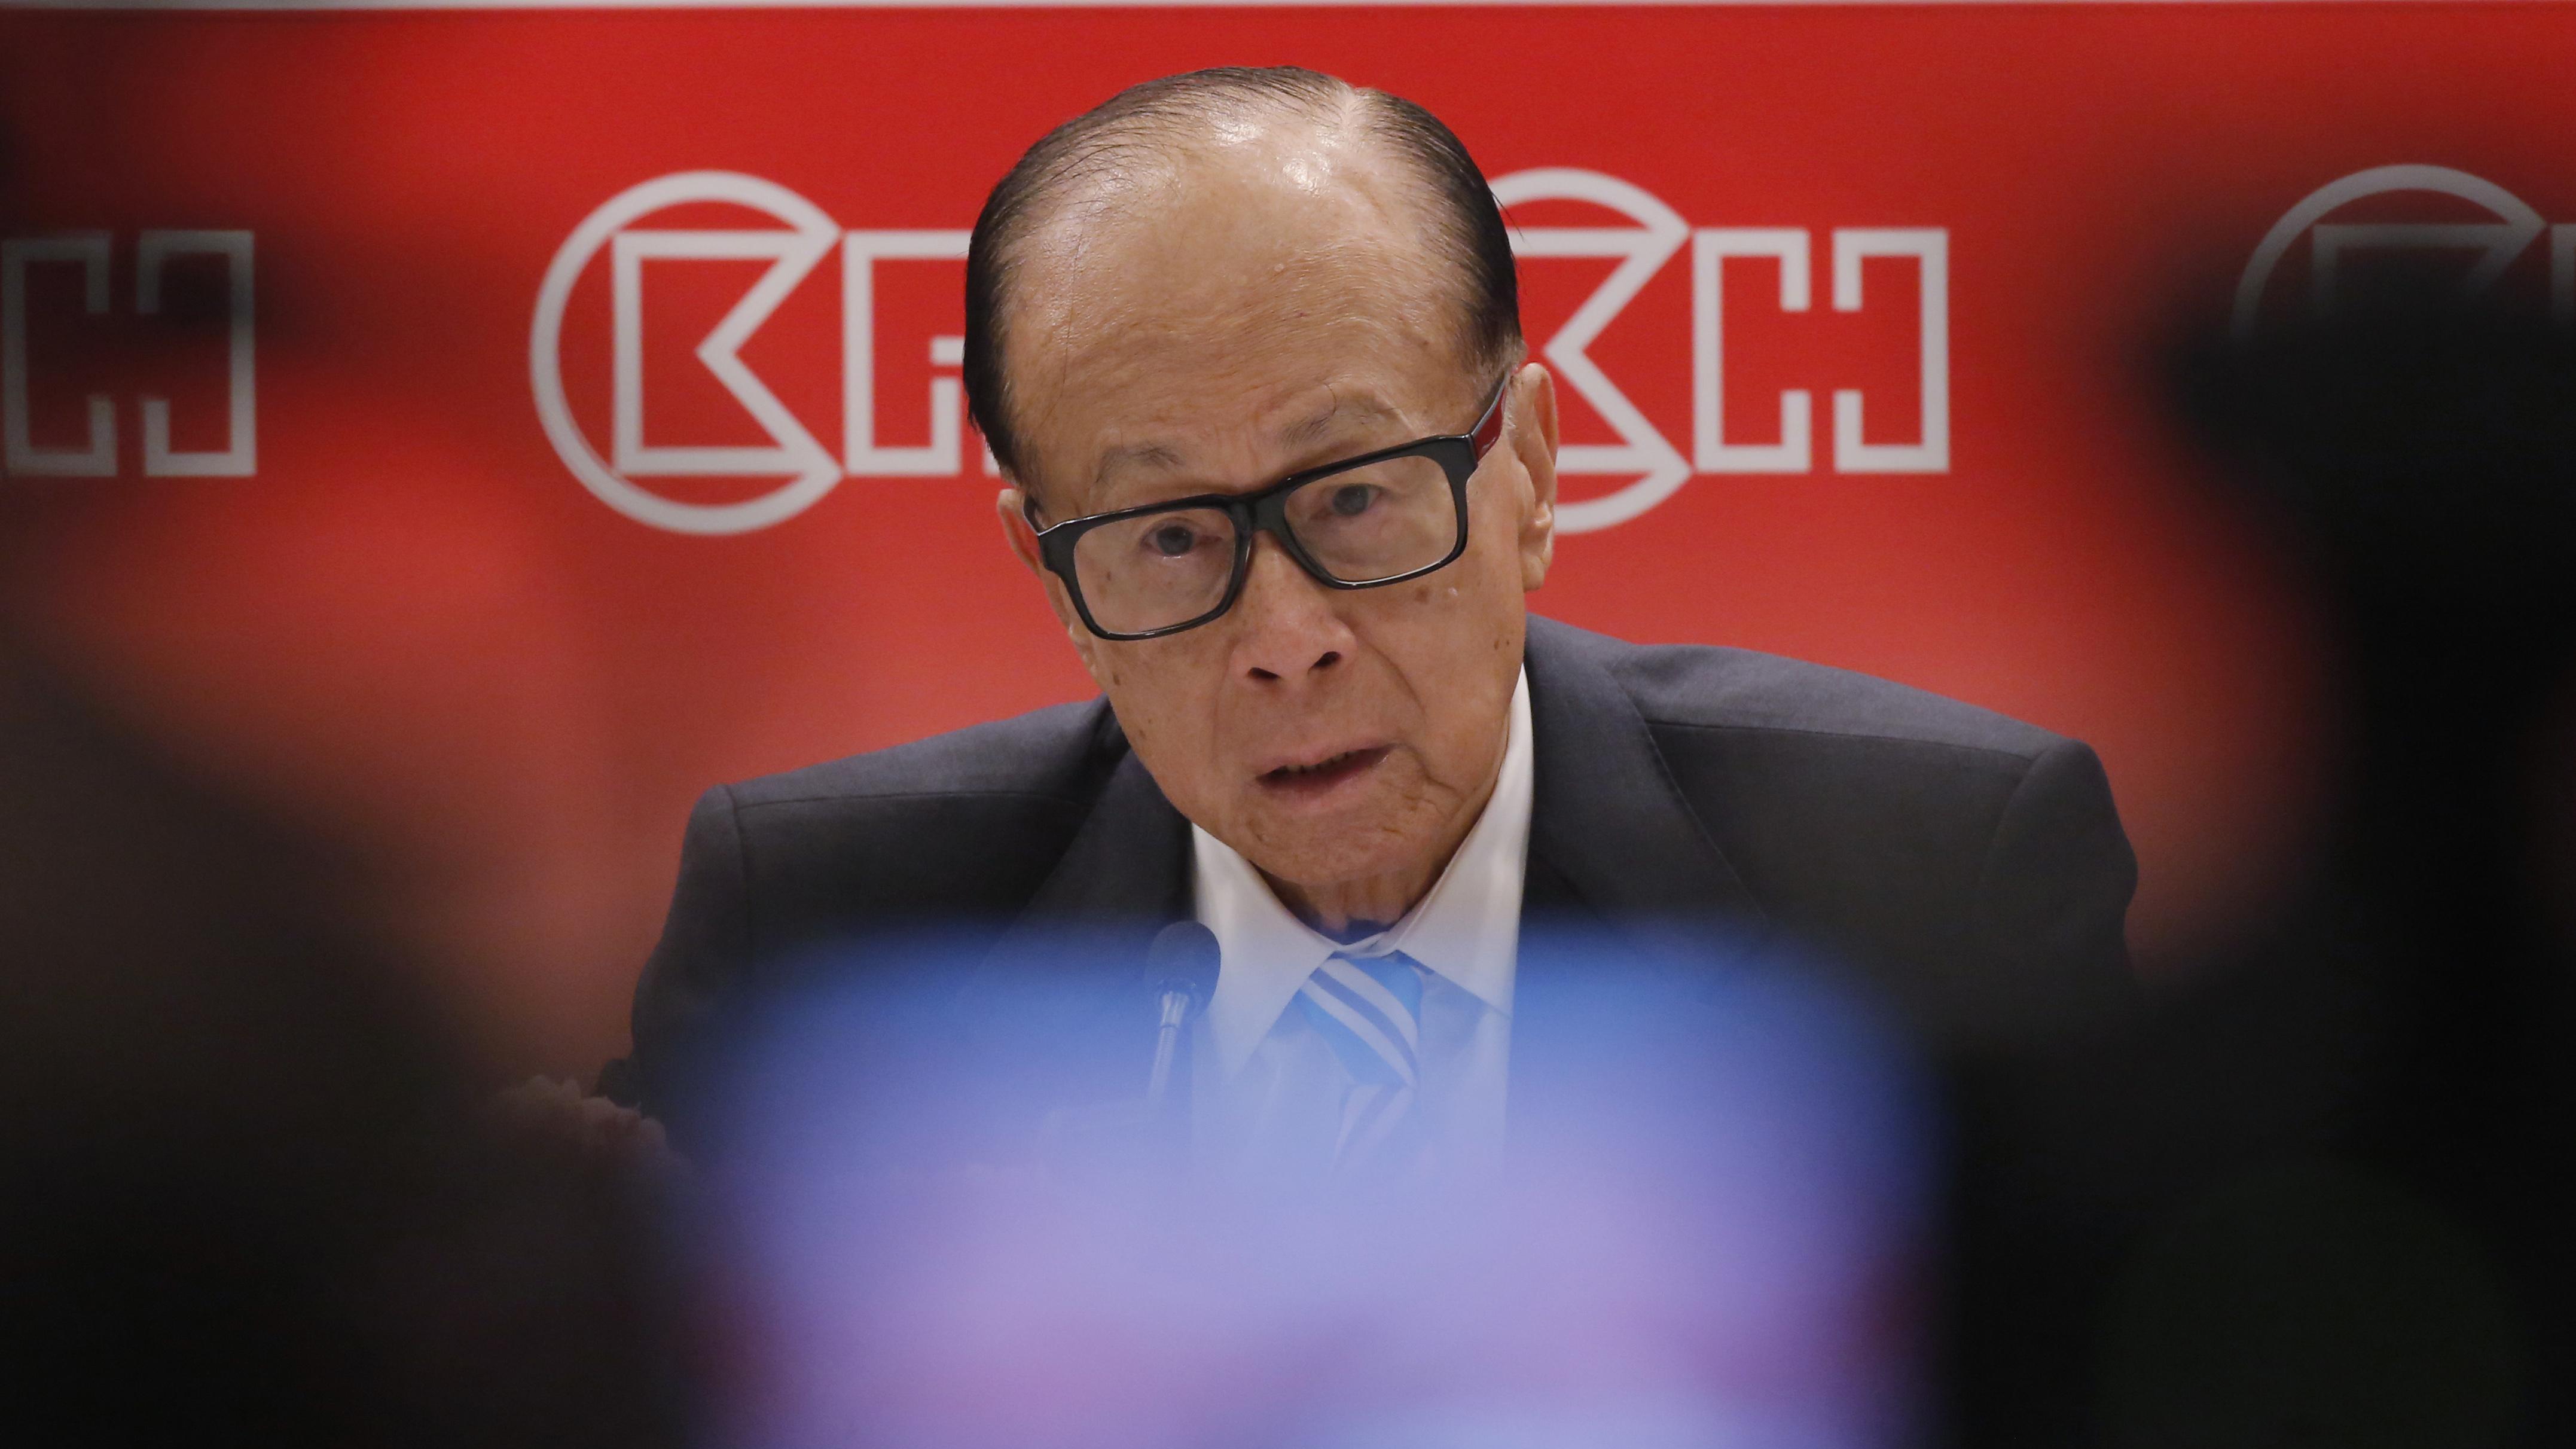 Hong Kong's richest man Li Ka-shing defends China's plans for security law